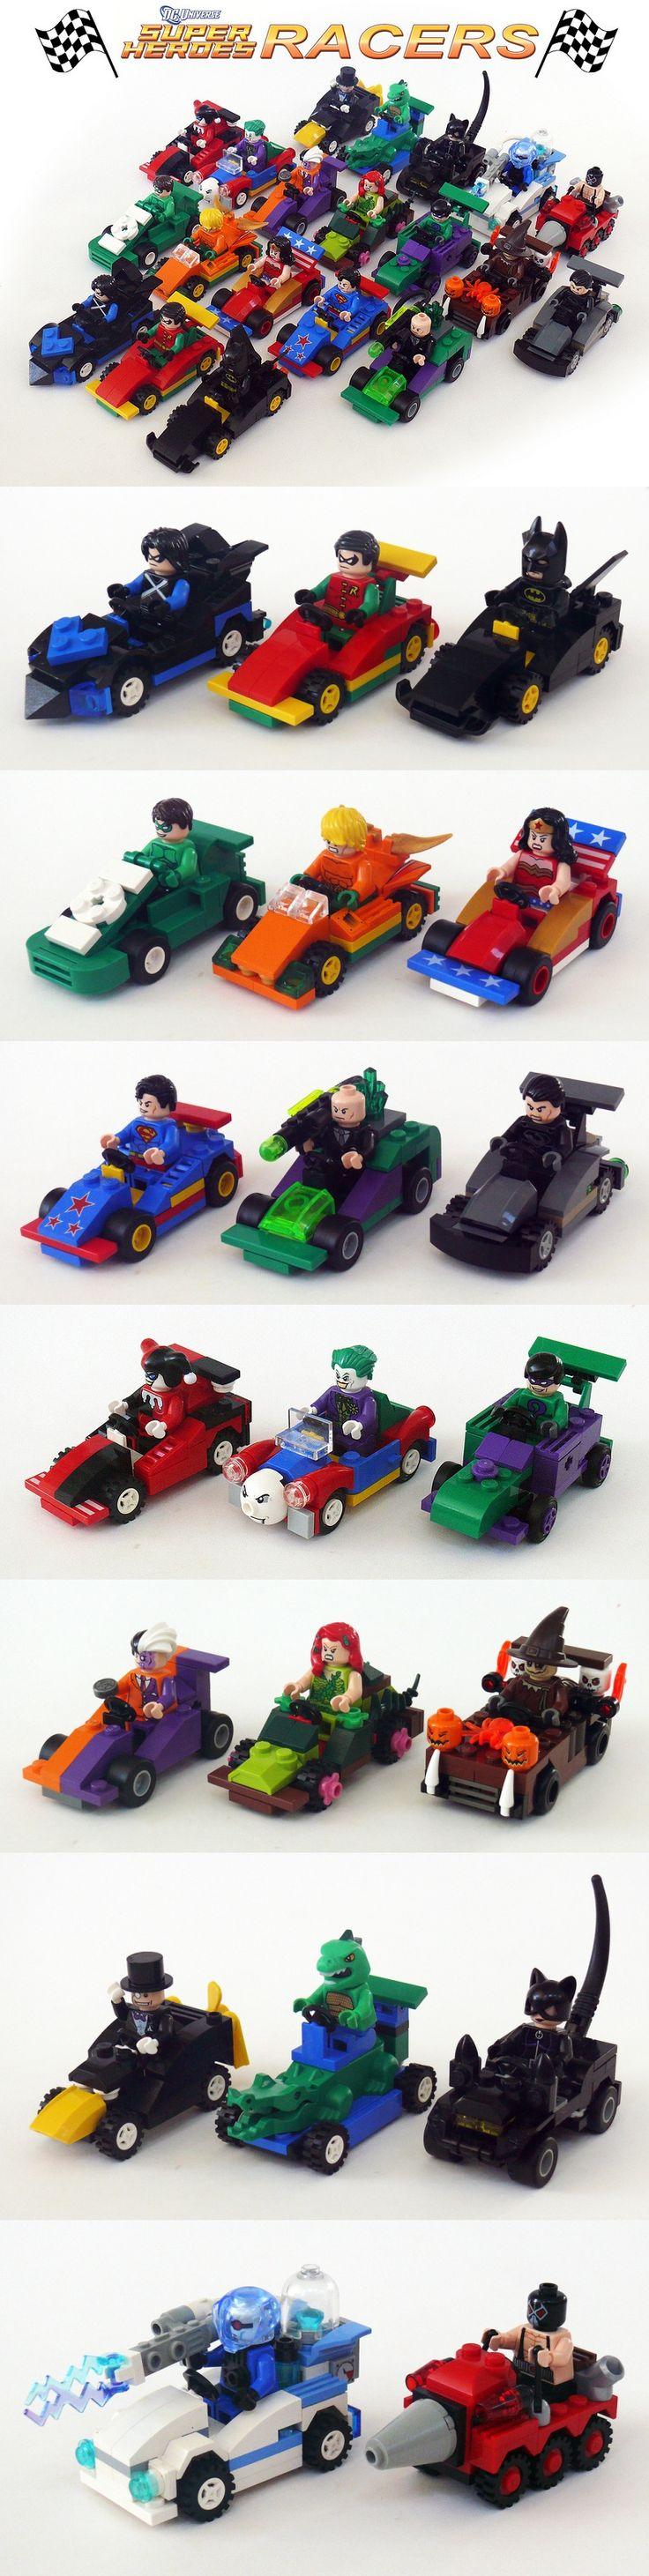 DC Superheroes Racers #LEGO #Superheroes #DC